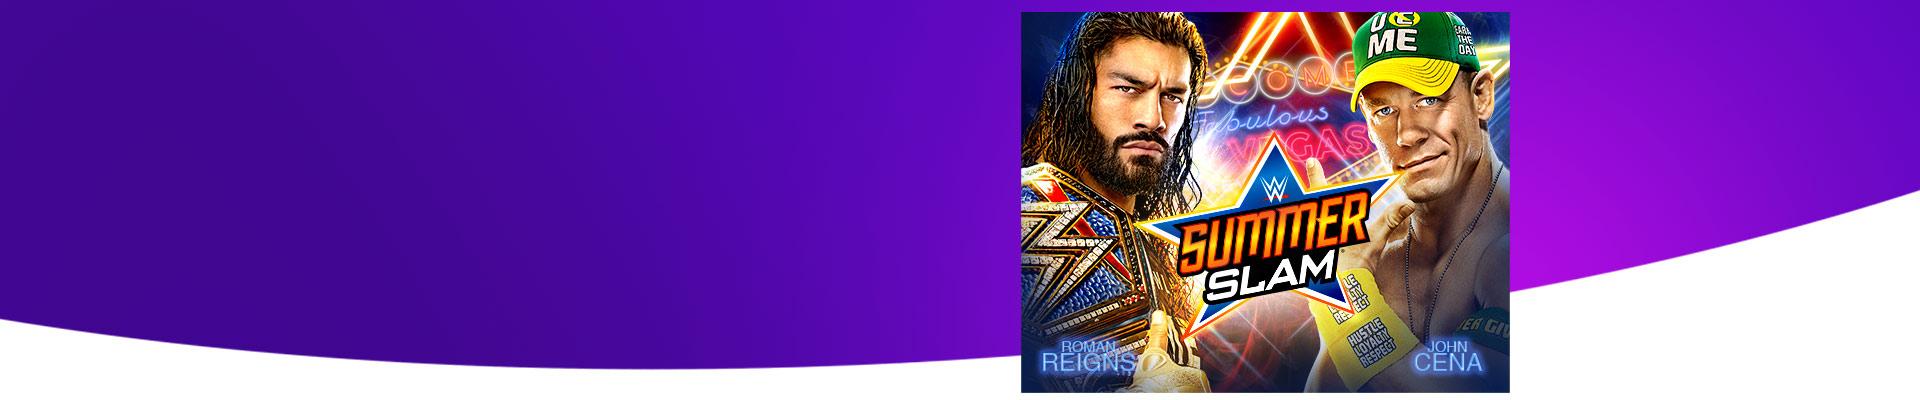 <b>Watch</b> WWE SummerSlam on <b>BT Sport Box Office</b>